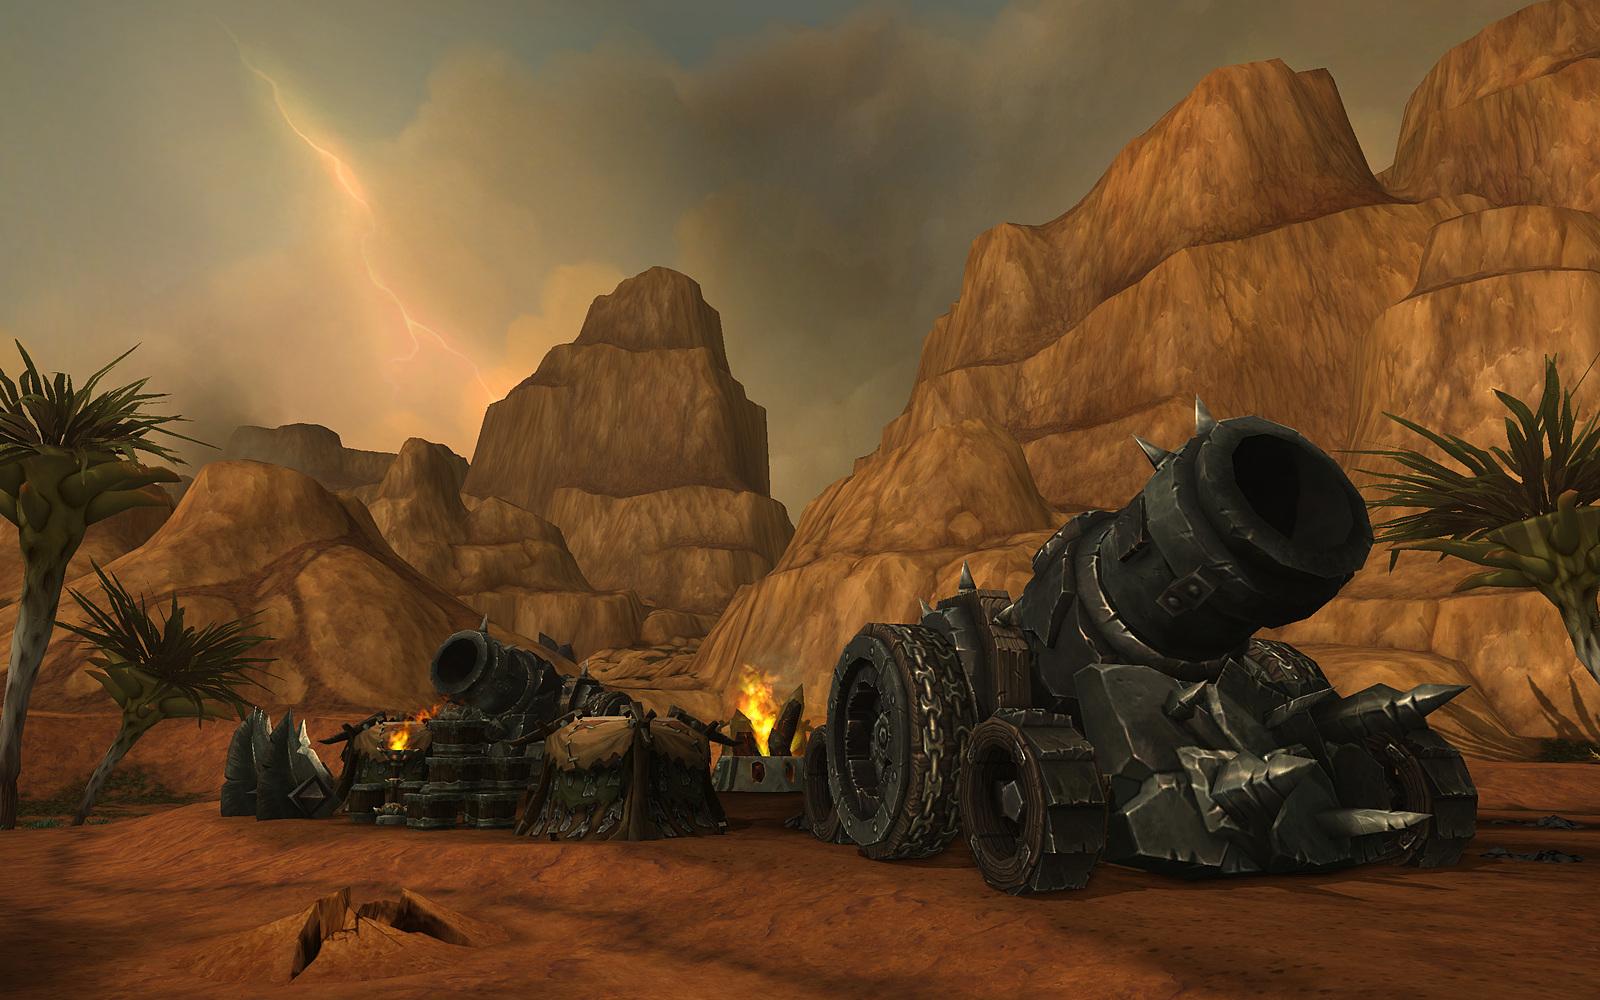 warlords-of-draenor-gorg0034-full.jpg